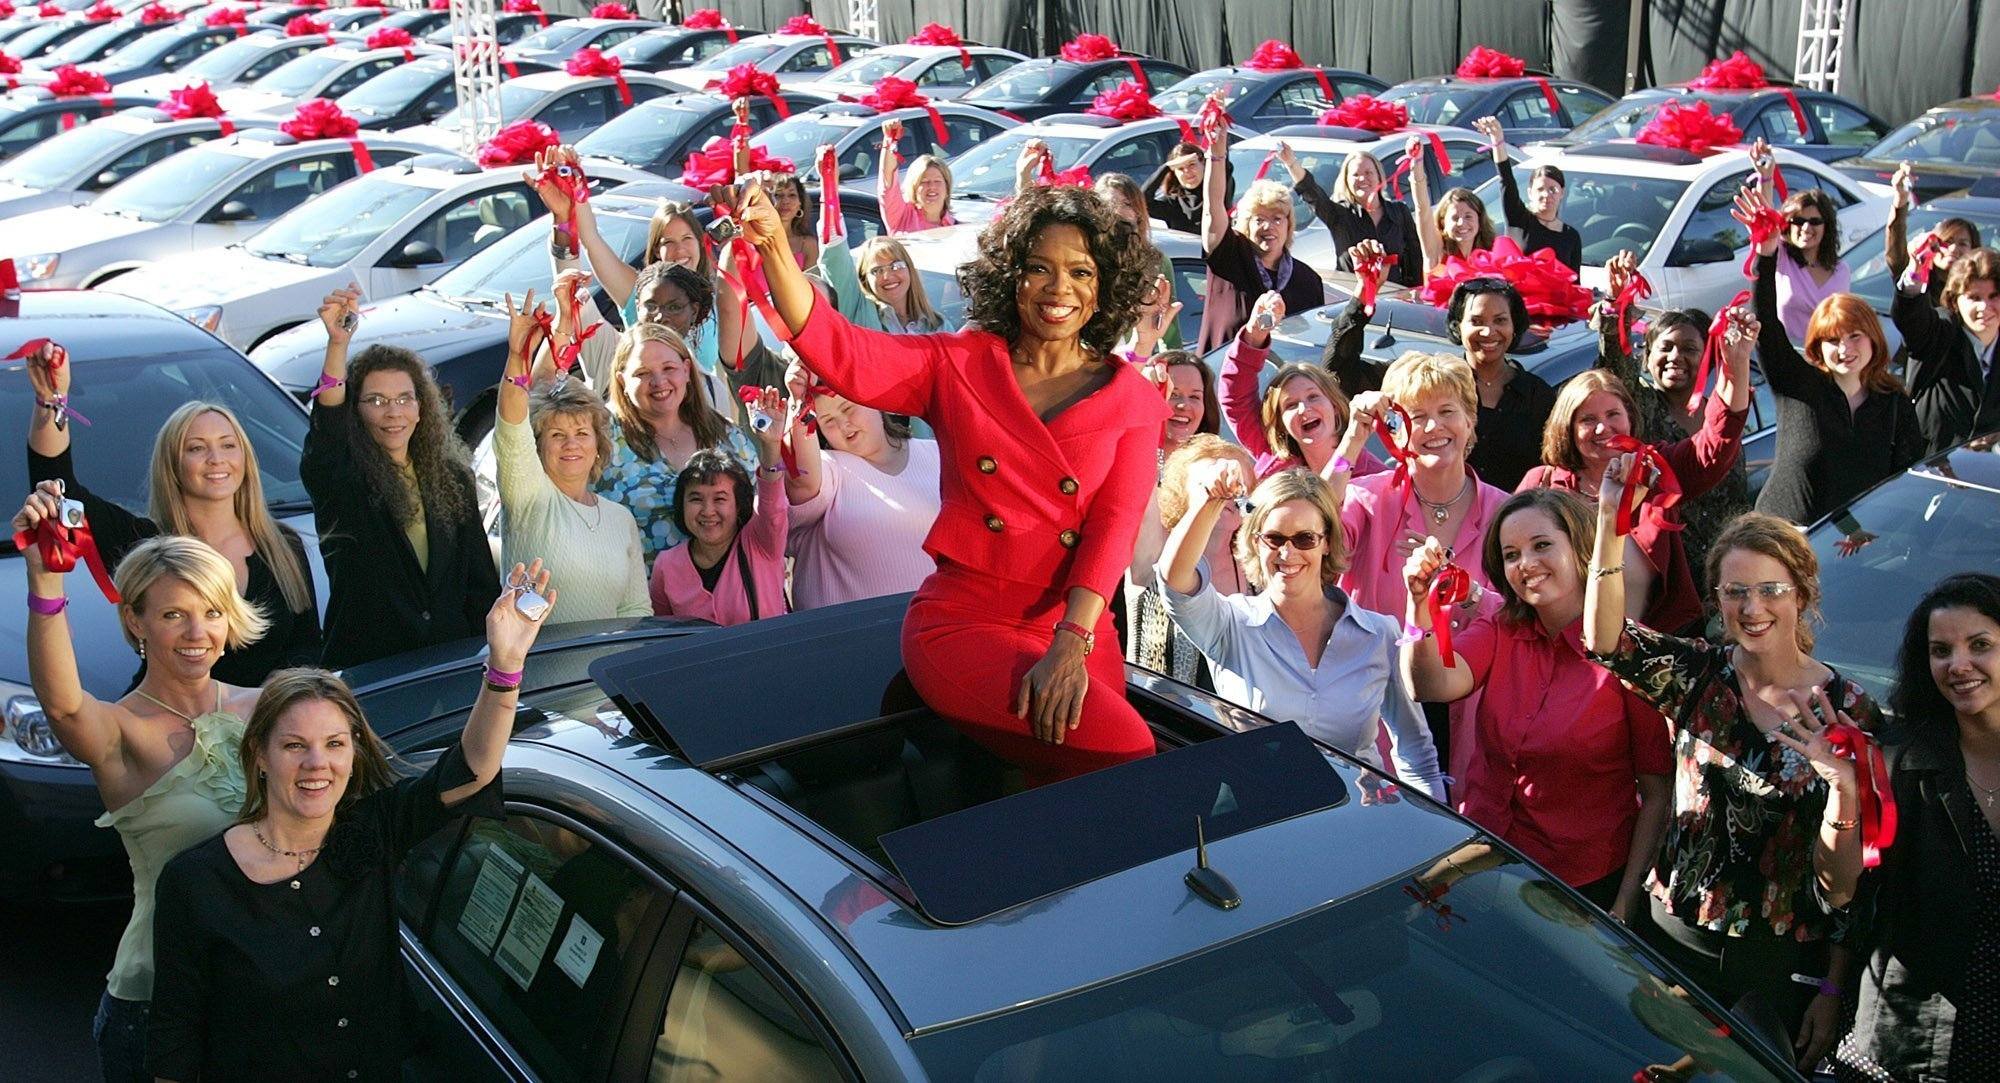 oprah winfrey revisits famous 2004 car giveaway chicago tribune. Black Bedroom Furniture Sets. Home Design Ideas